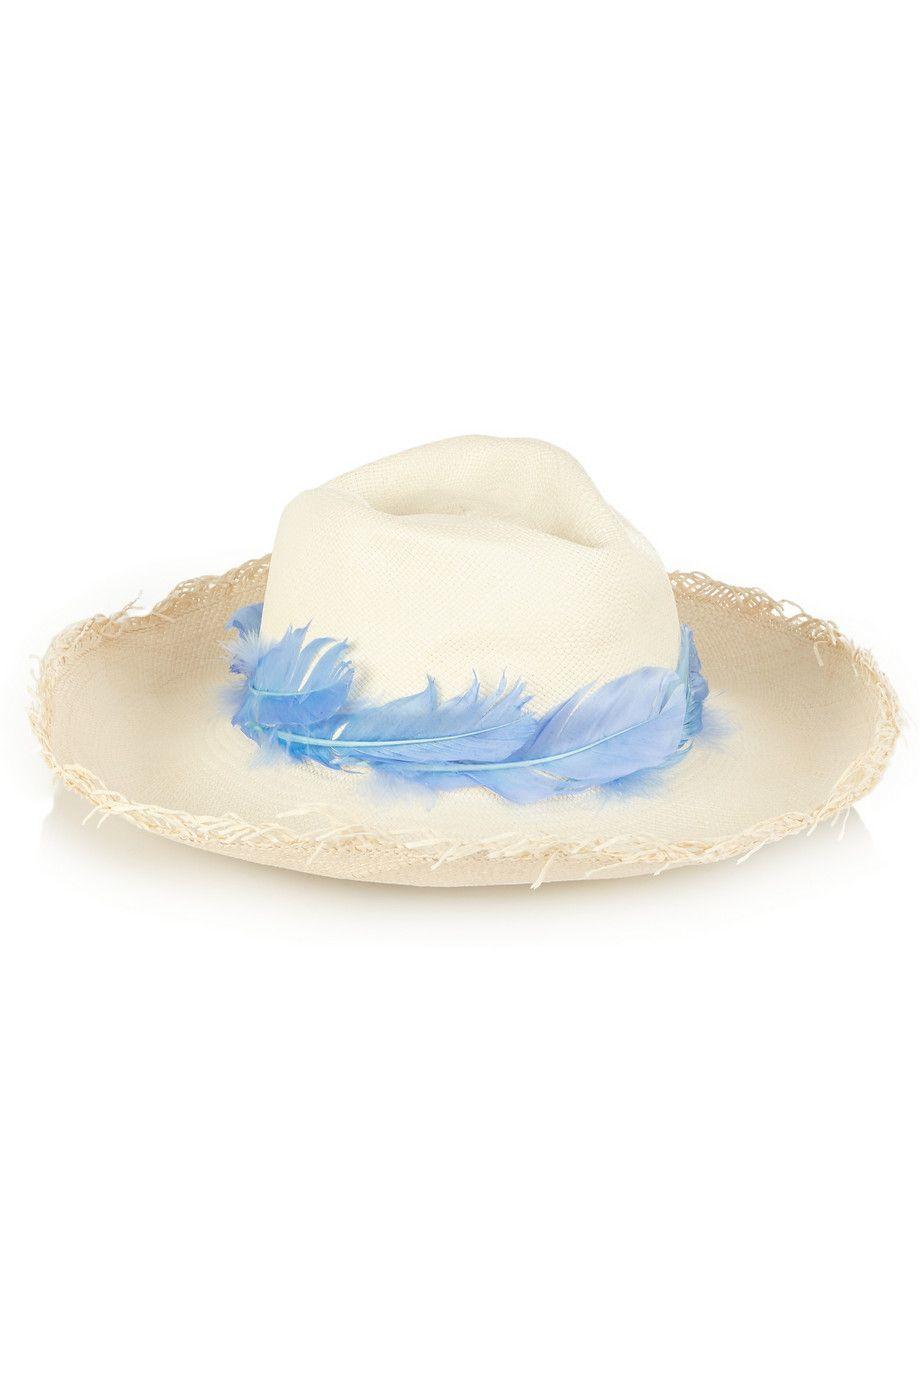 Toquilla Straw Panama Hat - Blue Sensi Studio uRHTMZN